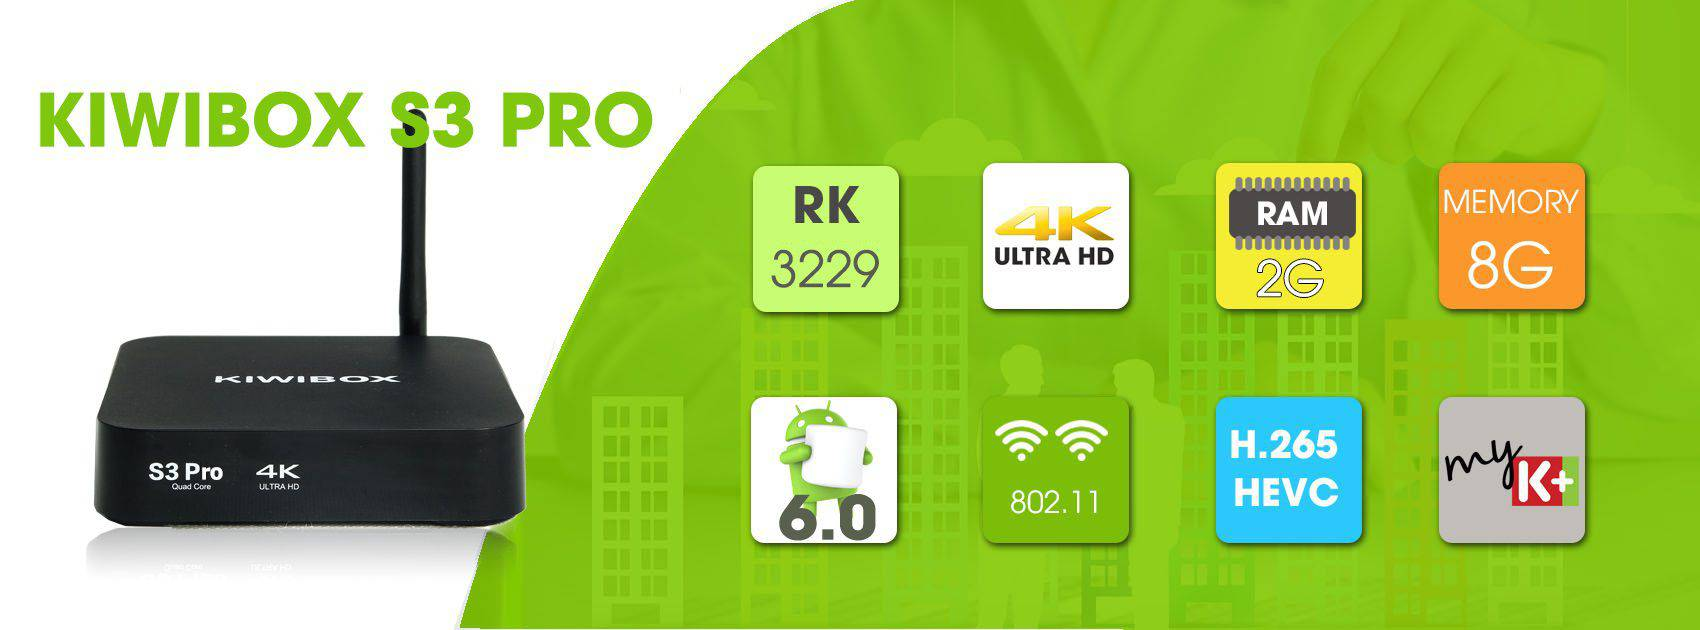 Kiwibox S3 Pro - RAM 2G, Android 6.0 2017